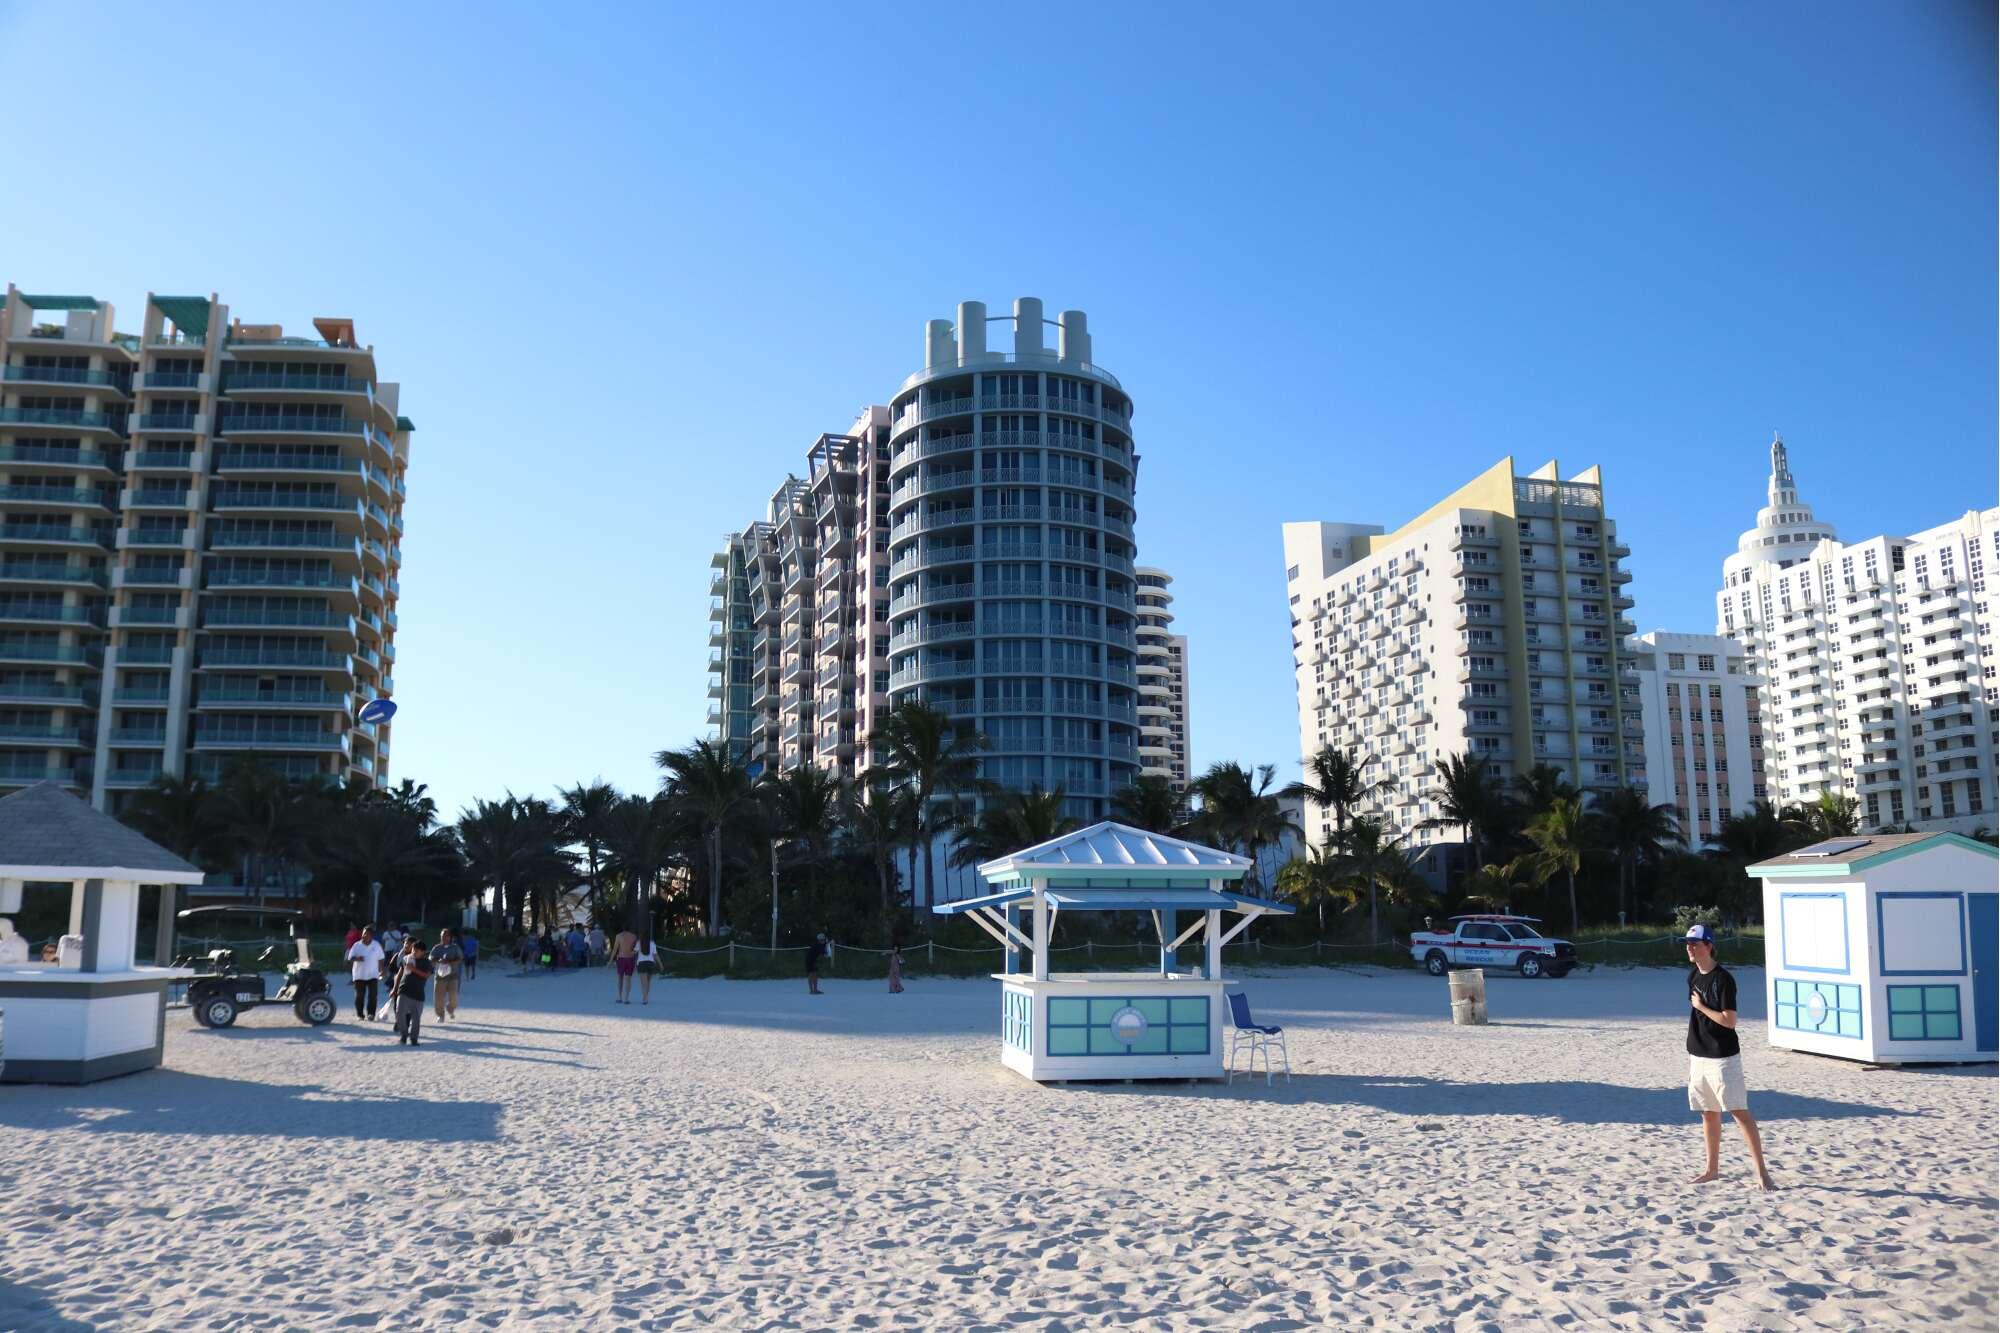 South Beach Florida The Most Prestigious Town In America on 1500 Ocean Drive South Beach Miami